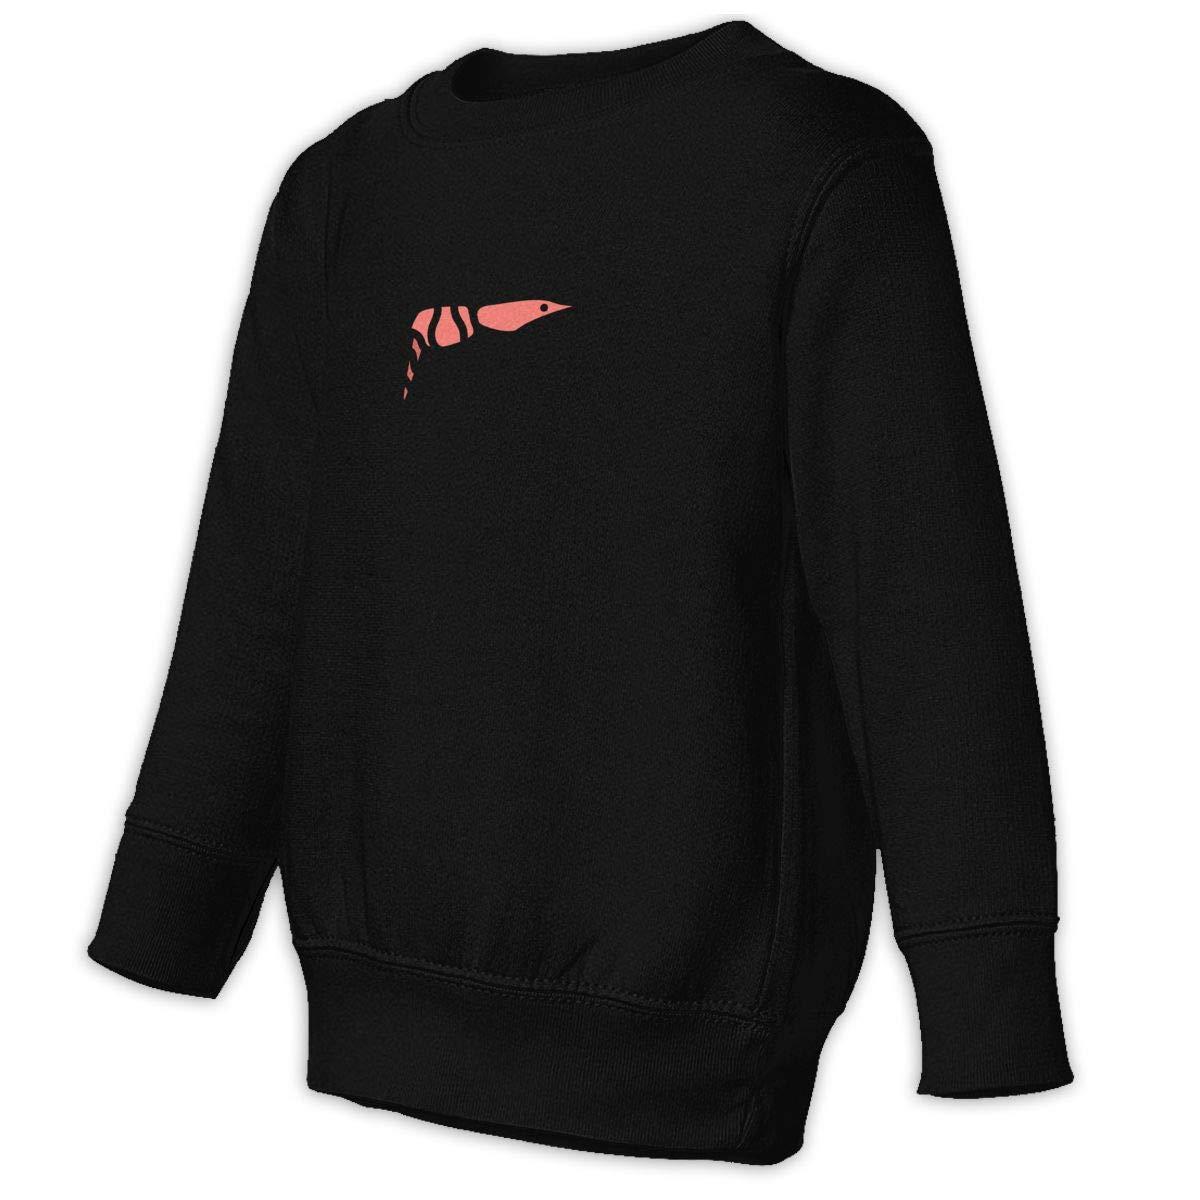 Shrimp Unisex Toddler Hoodies Fleece Pull Over Sweatshirt for Boys Girls Kids Youth